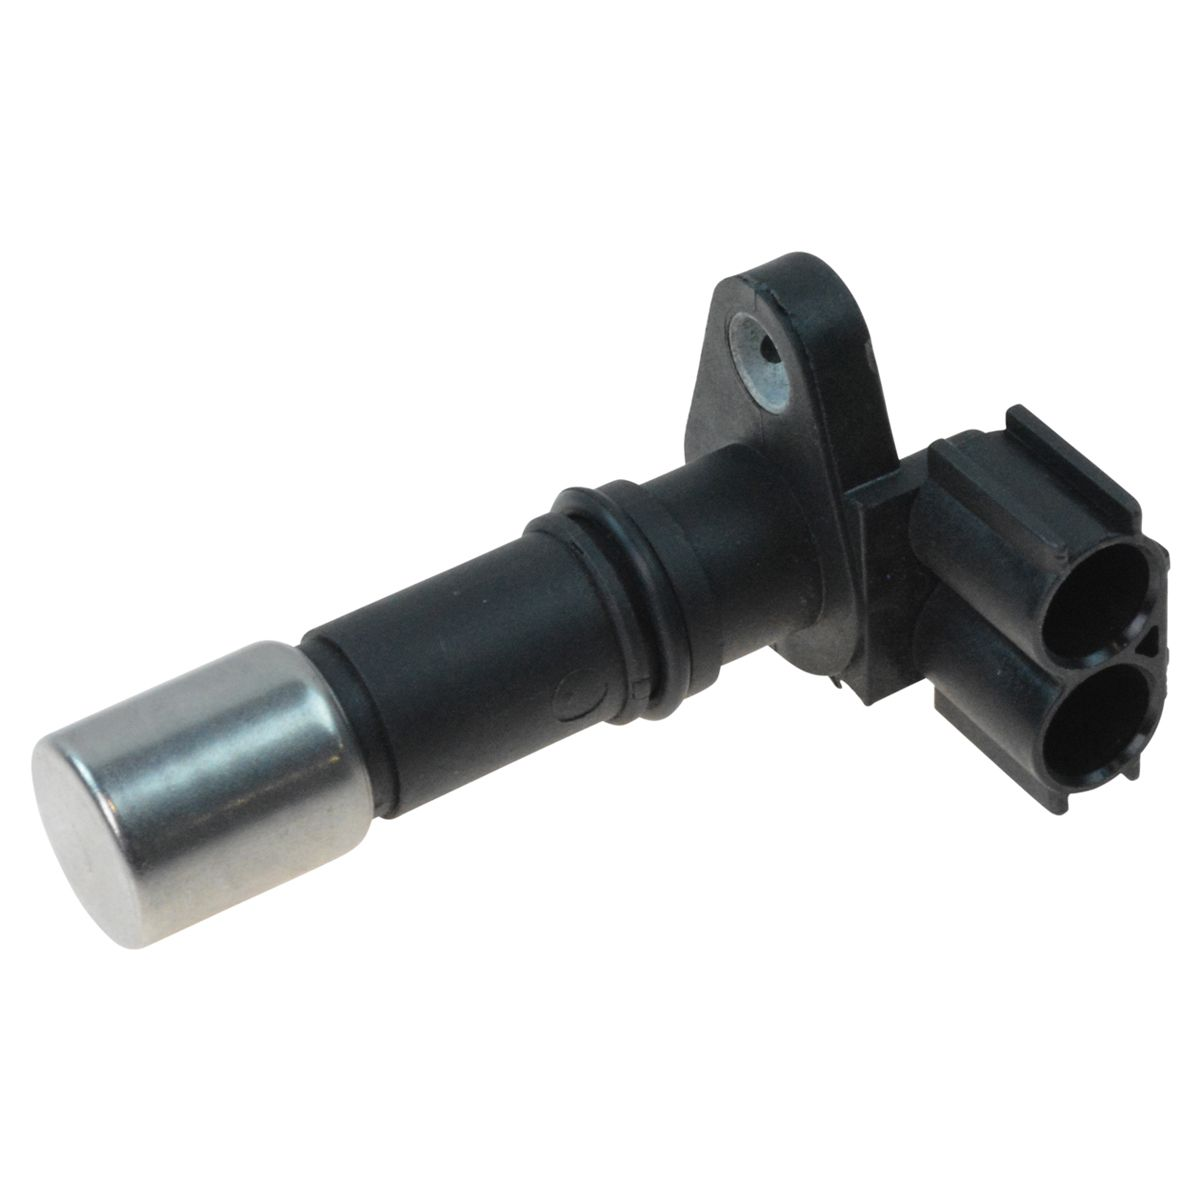 Dorman 917-751 Crankshaft Position Sensor